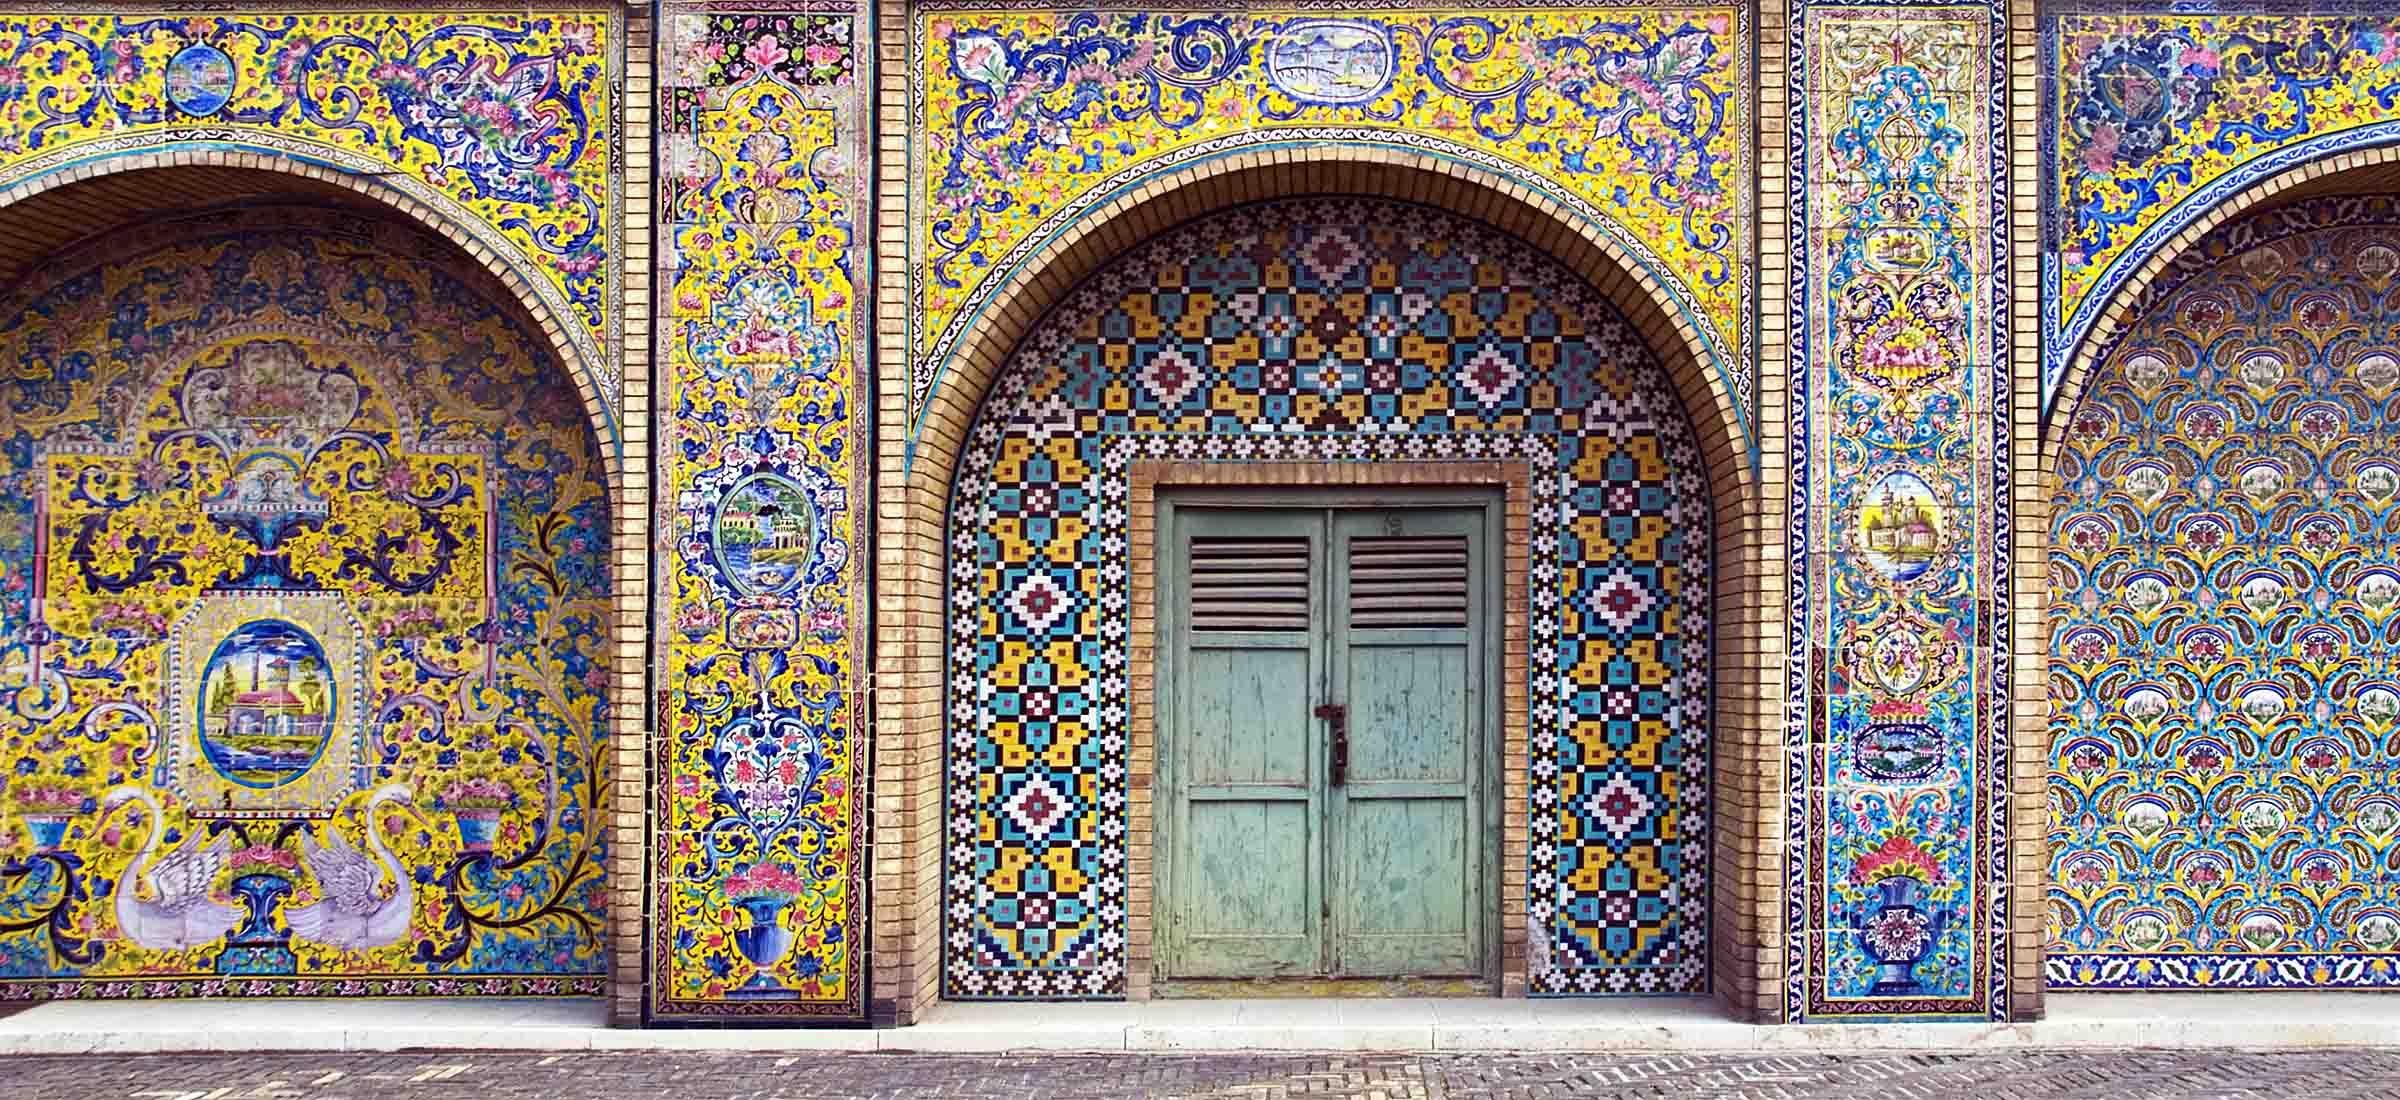 Iranian architecture and art in Golestan Garden